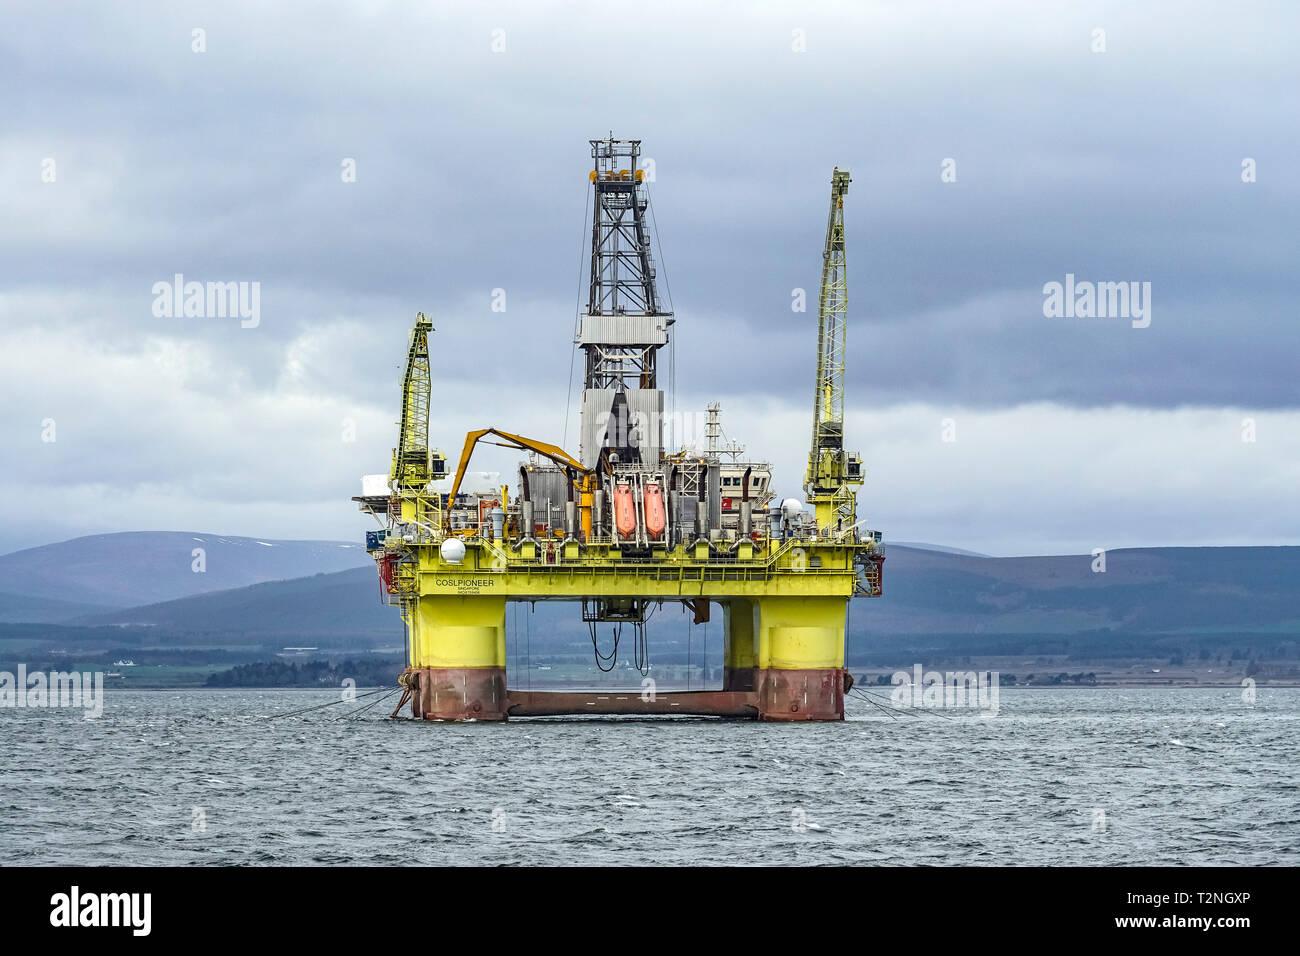 Moored platform COSLPIONEER in Cromarty Firth near Cromarty Black Isle Highland Scotland UK - Stock Image